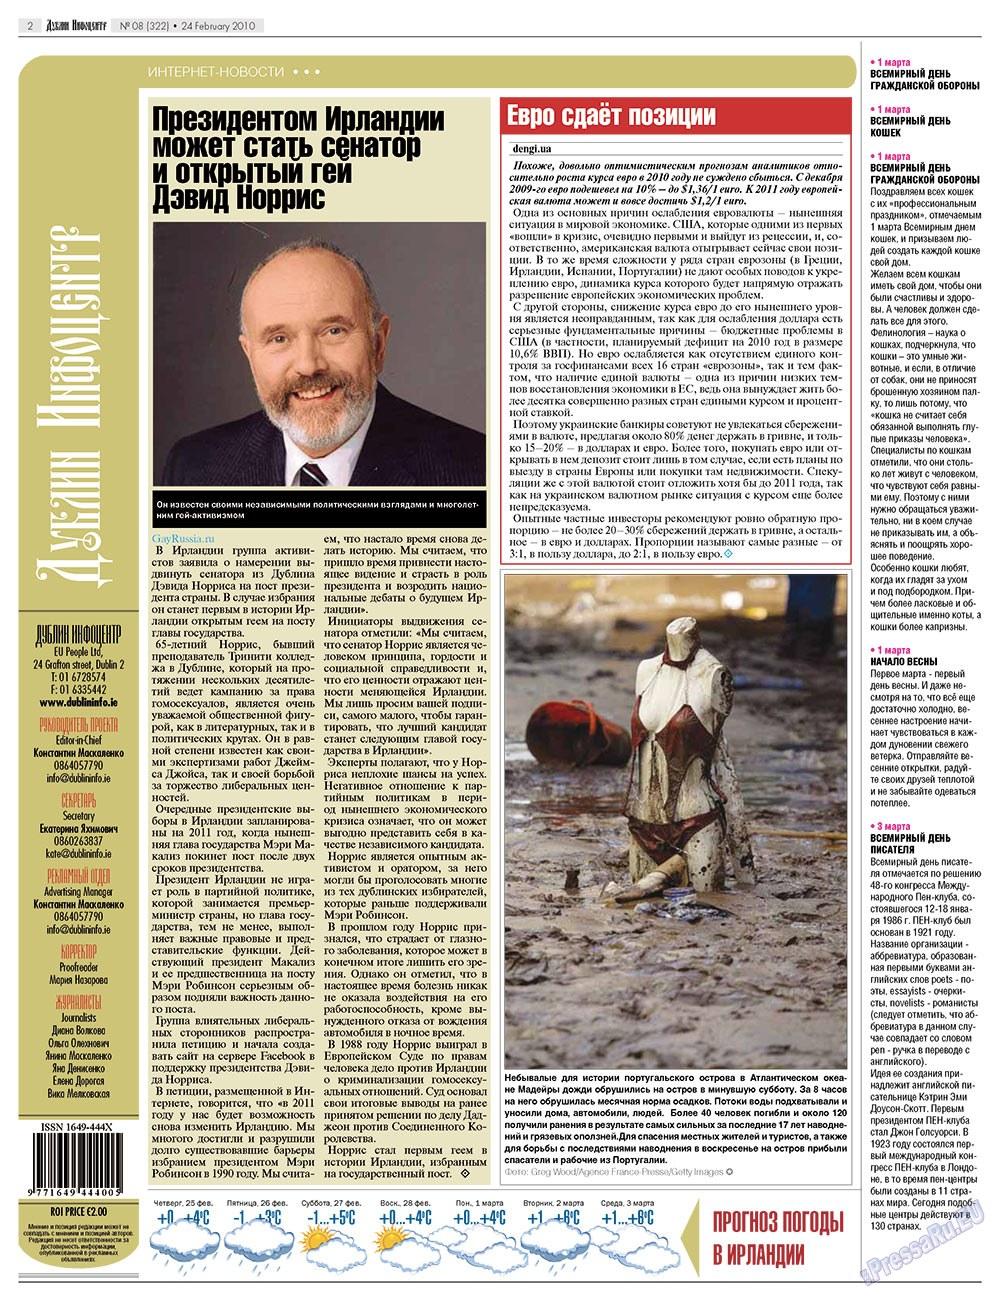 Дублин инфоцентр (газета). 2010 год, номер 8, стр. 2